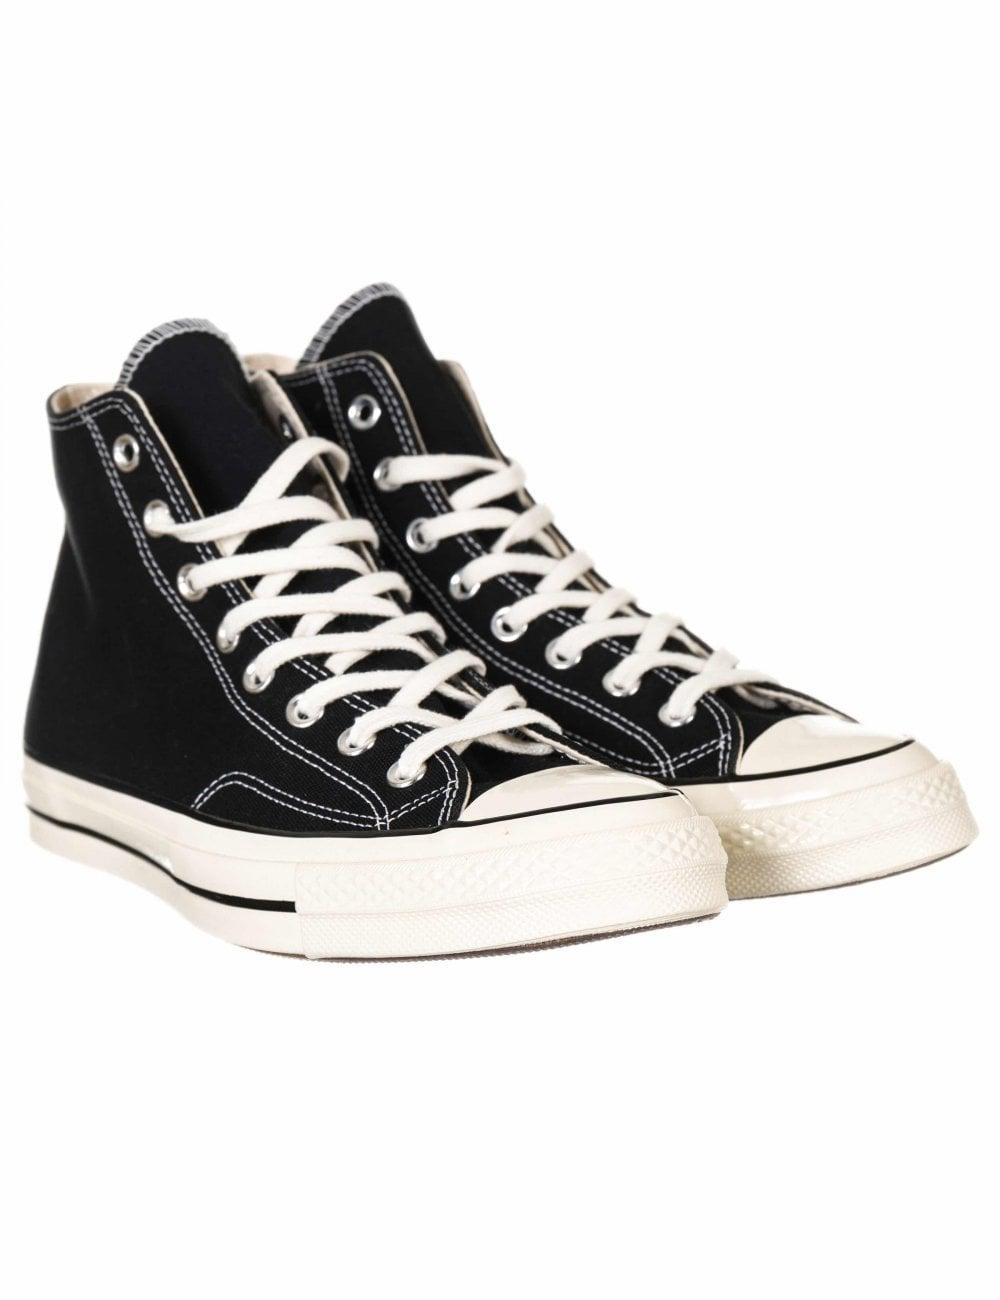 416620663f8 Converse 1970s Chuck Taylor All Star Hi Trainers - Black/Black/Egret ...